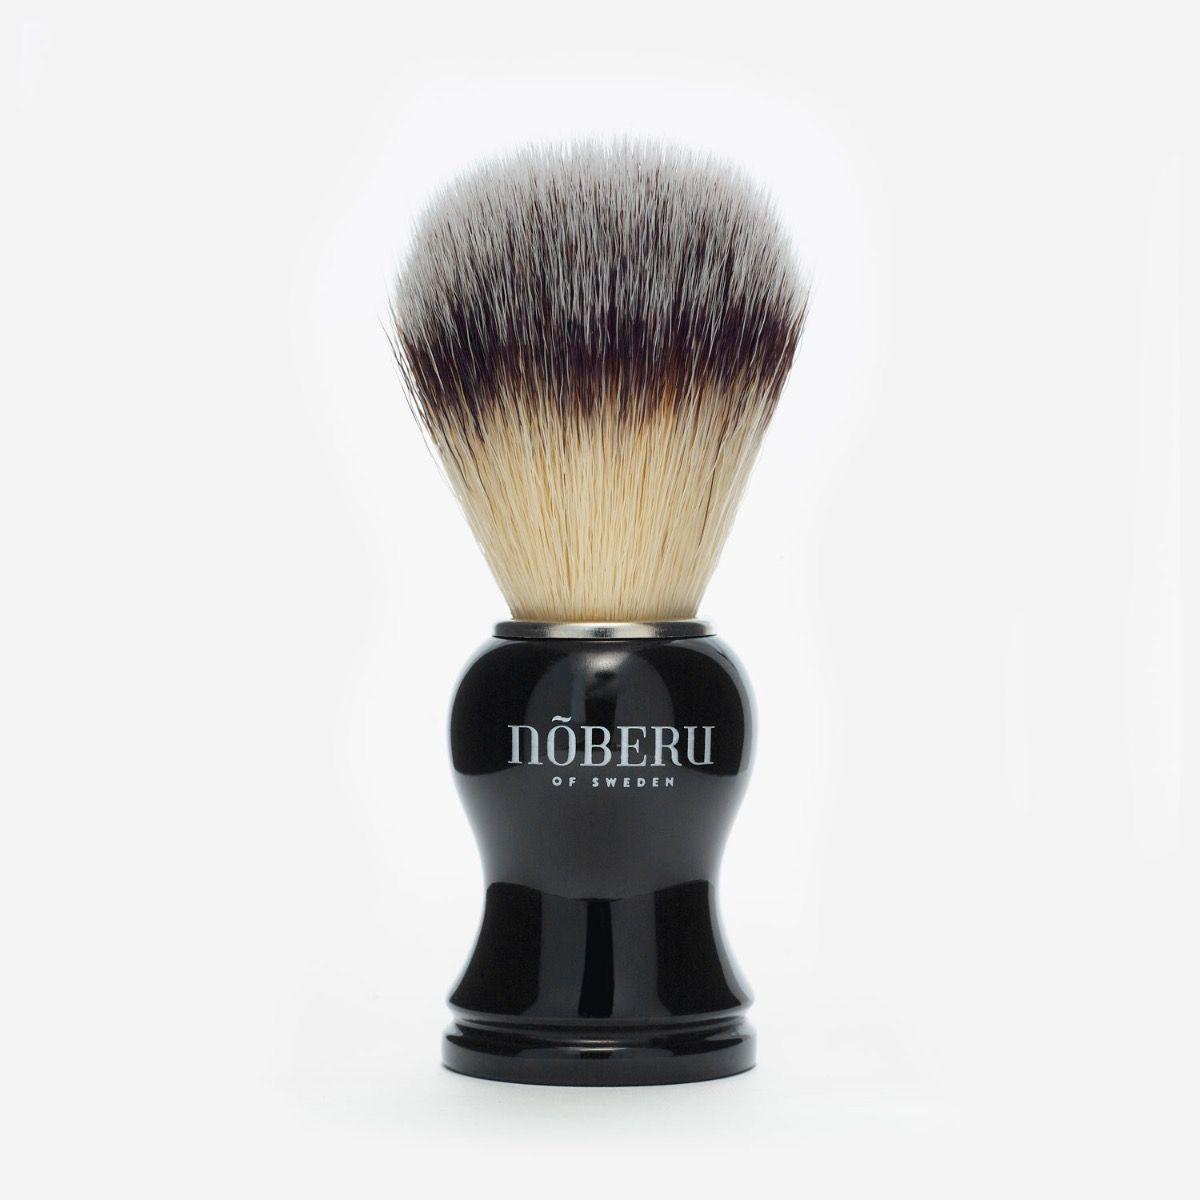 Nõberu Synthetic Shaving Brush